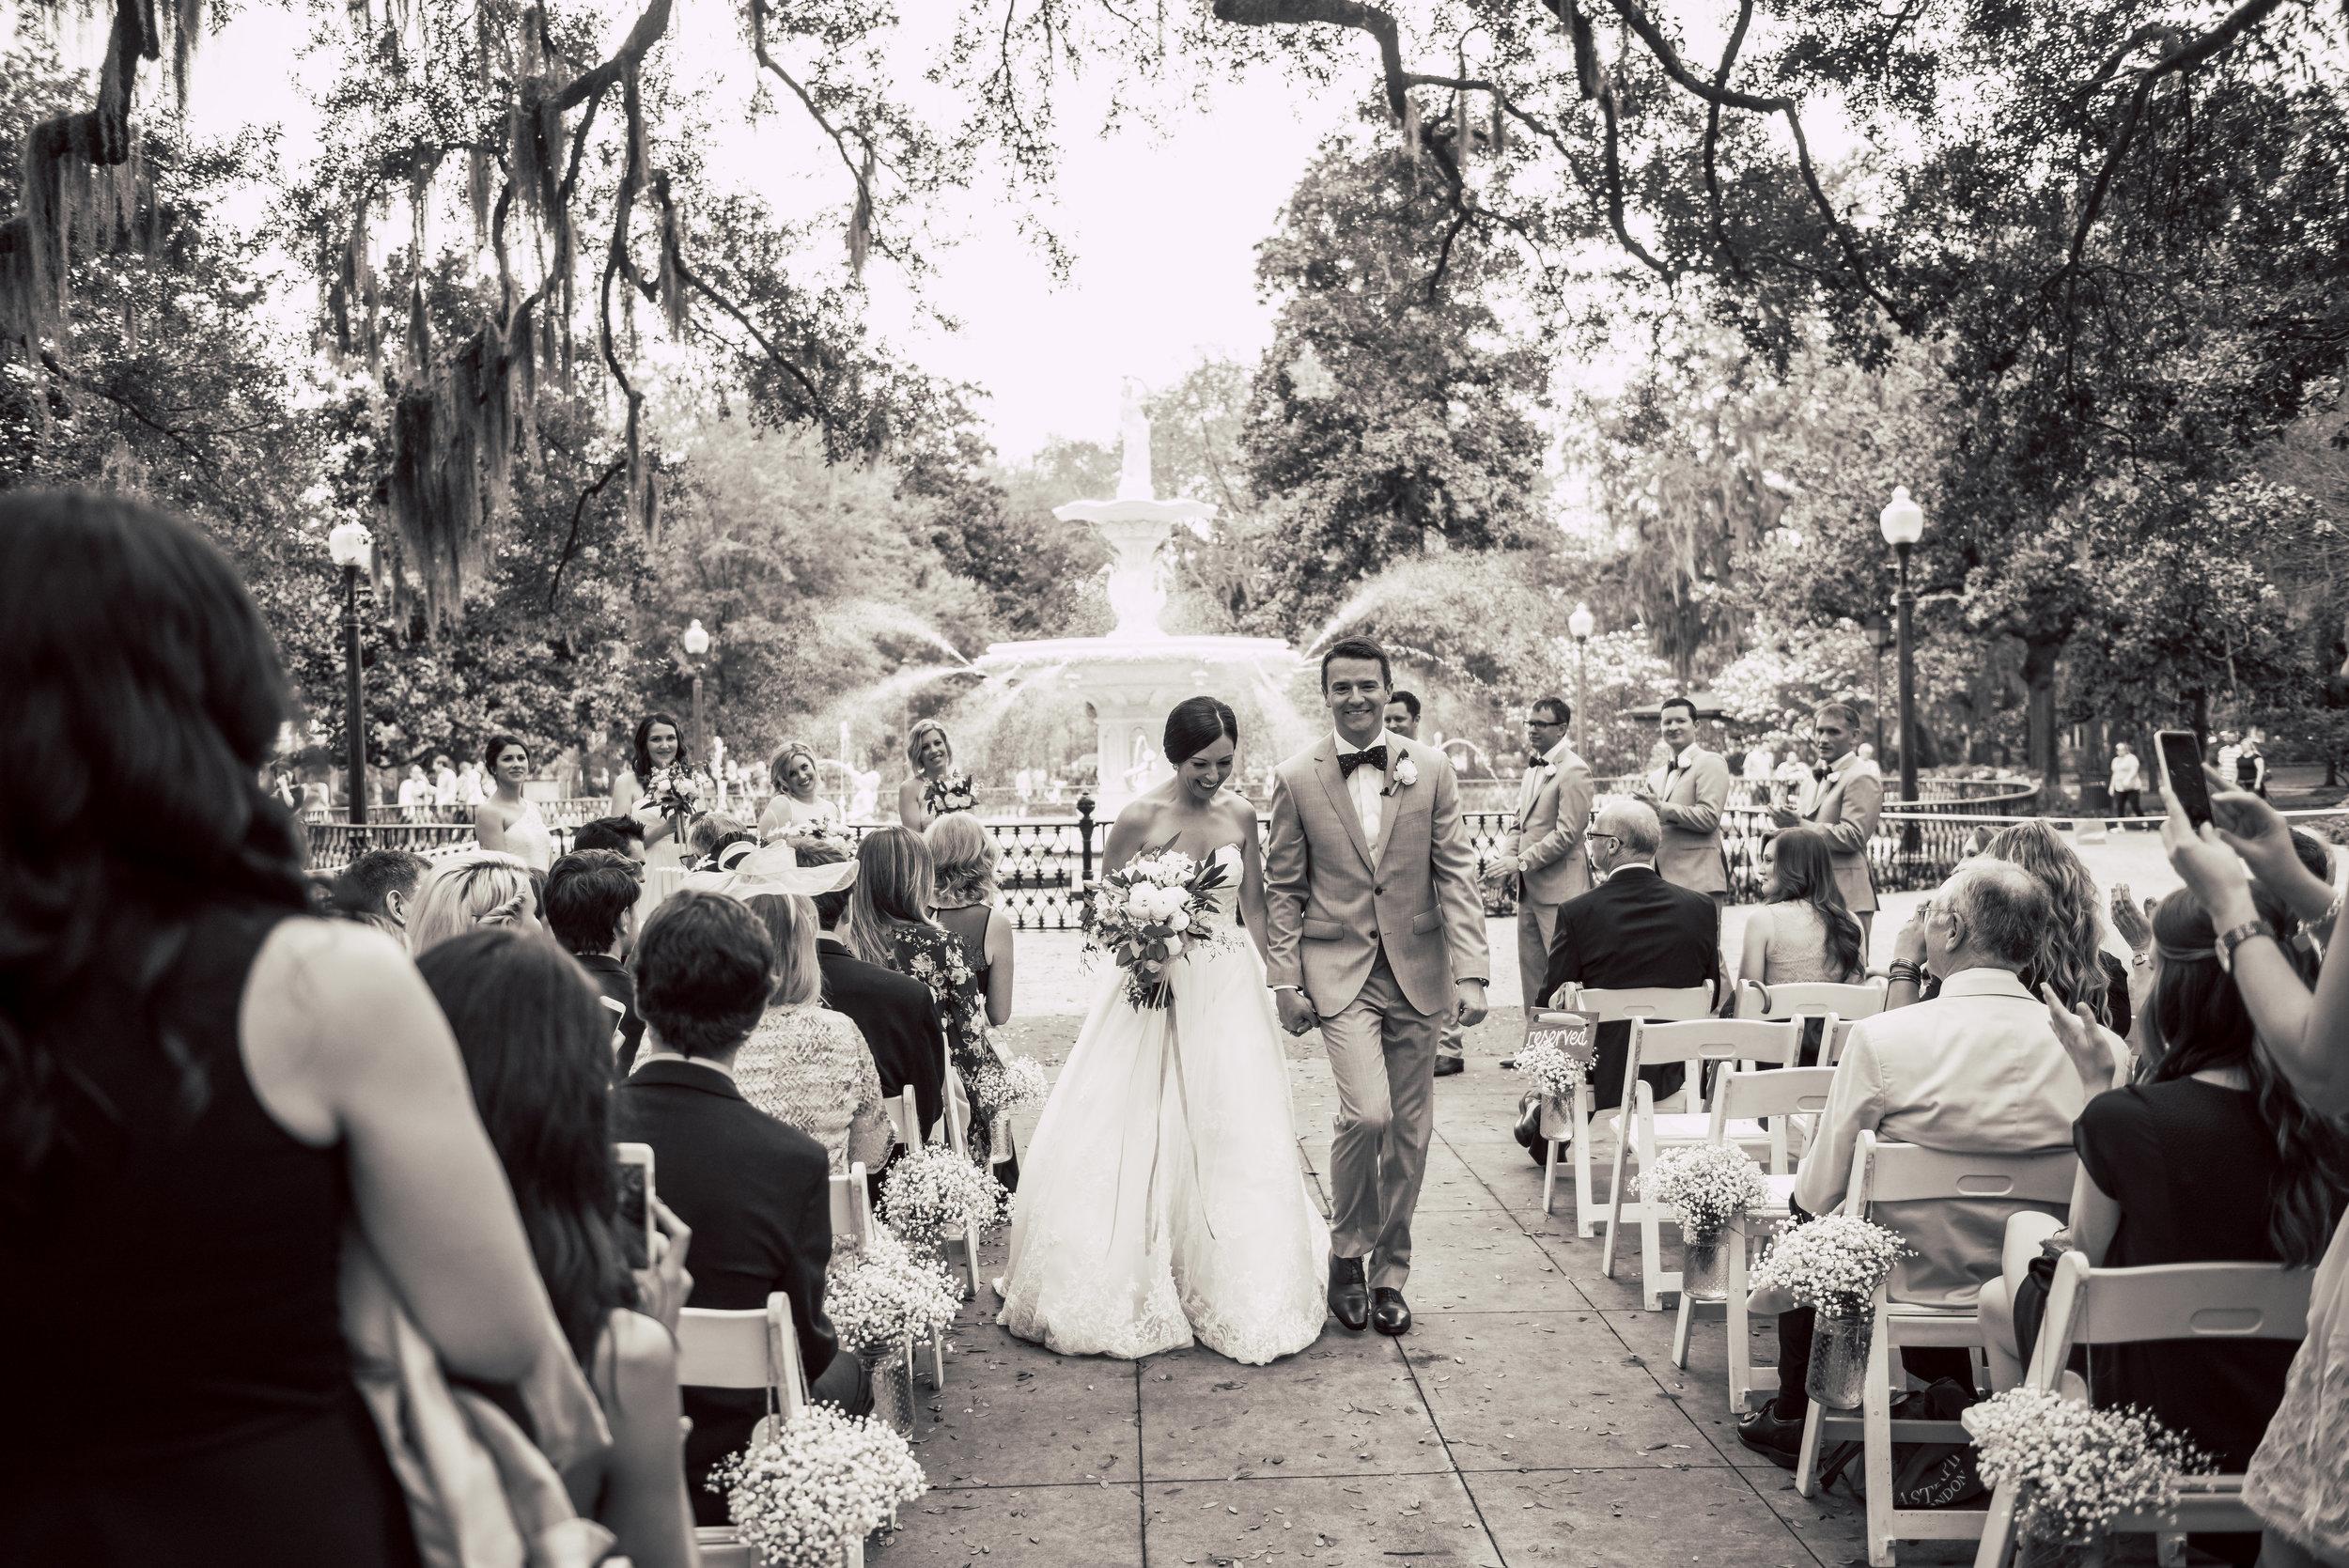 Max + Jackie's Forsyth Park ceremony in Savannah, Georgia